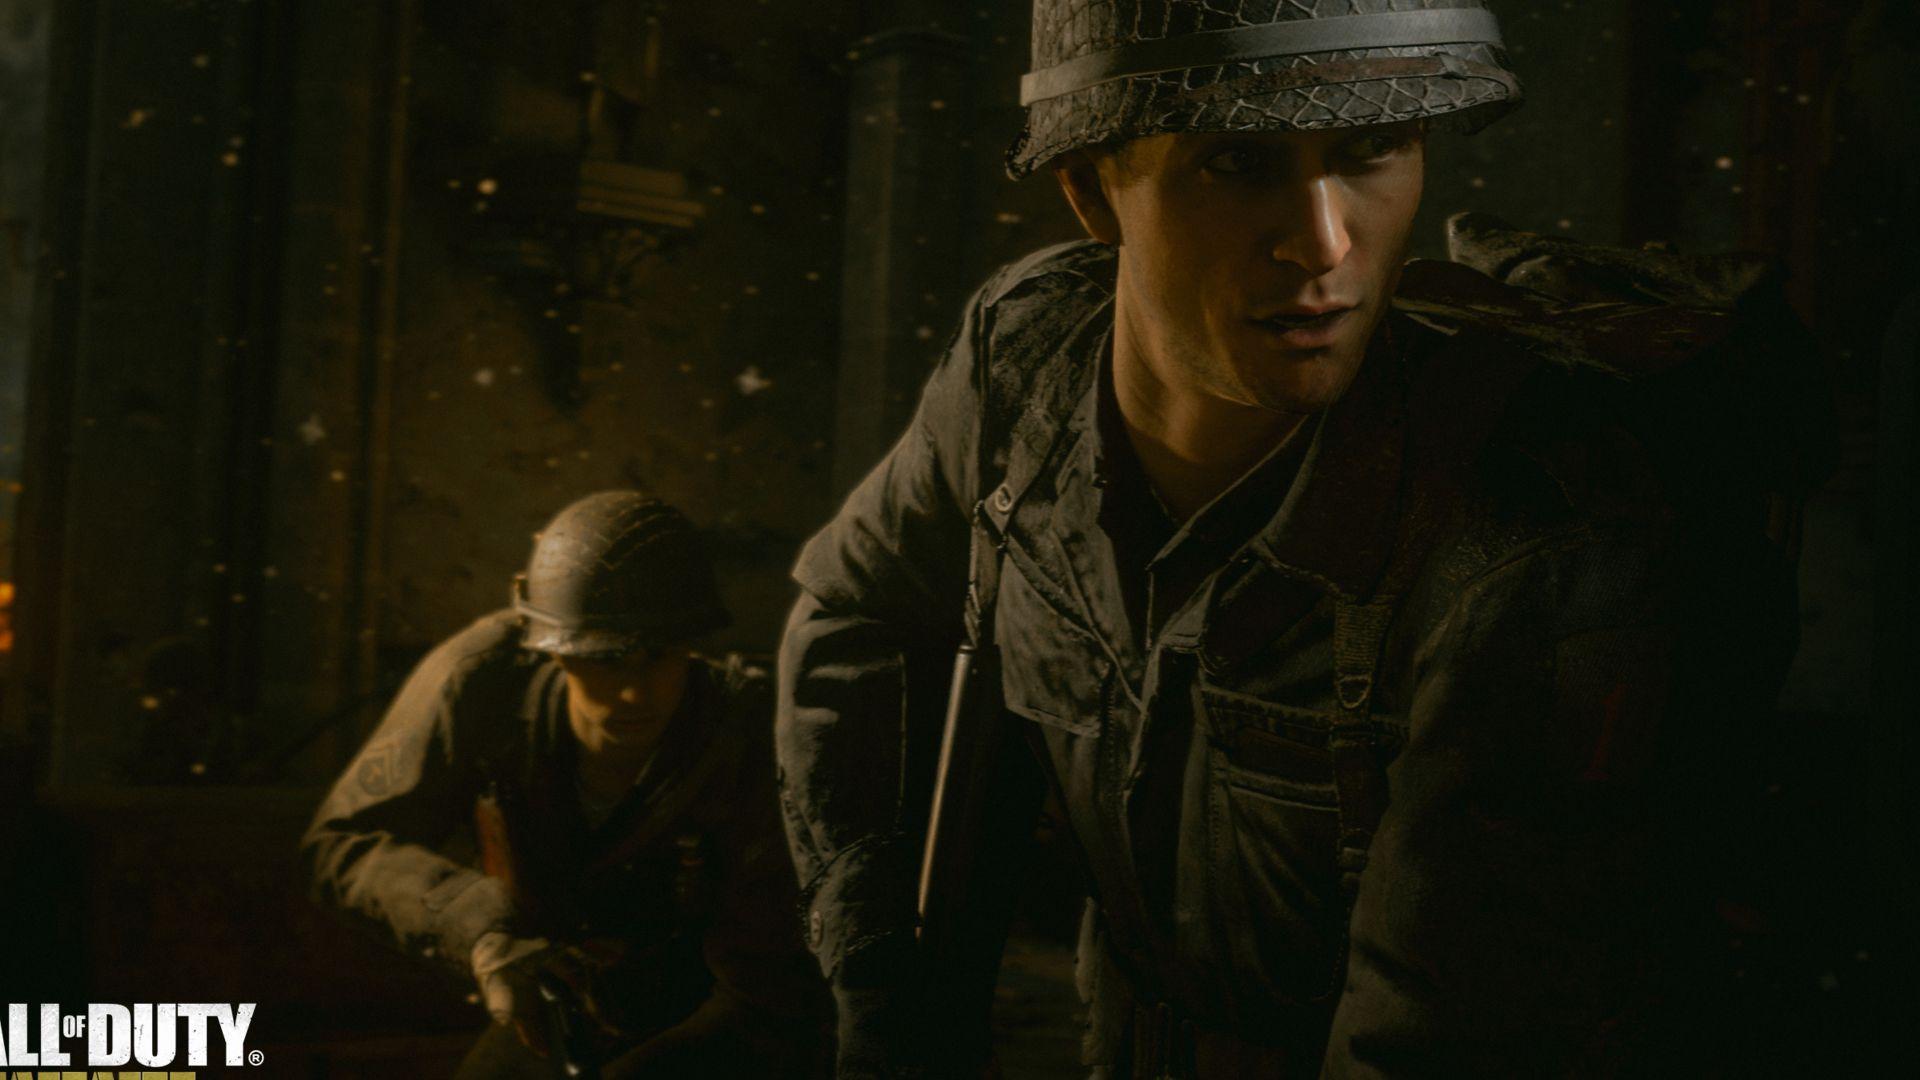 Call Of Duty Ww2 Wallpaper 4k: Wallpaper Call Of Duty: WW2, Screenshot, E3 2017, 4k